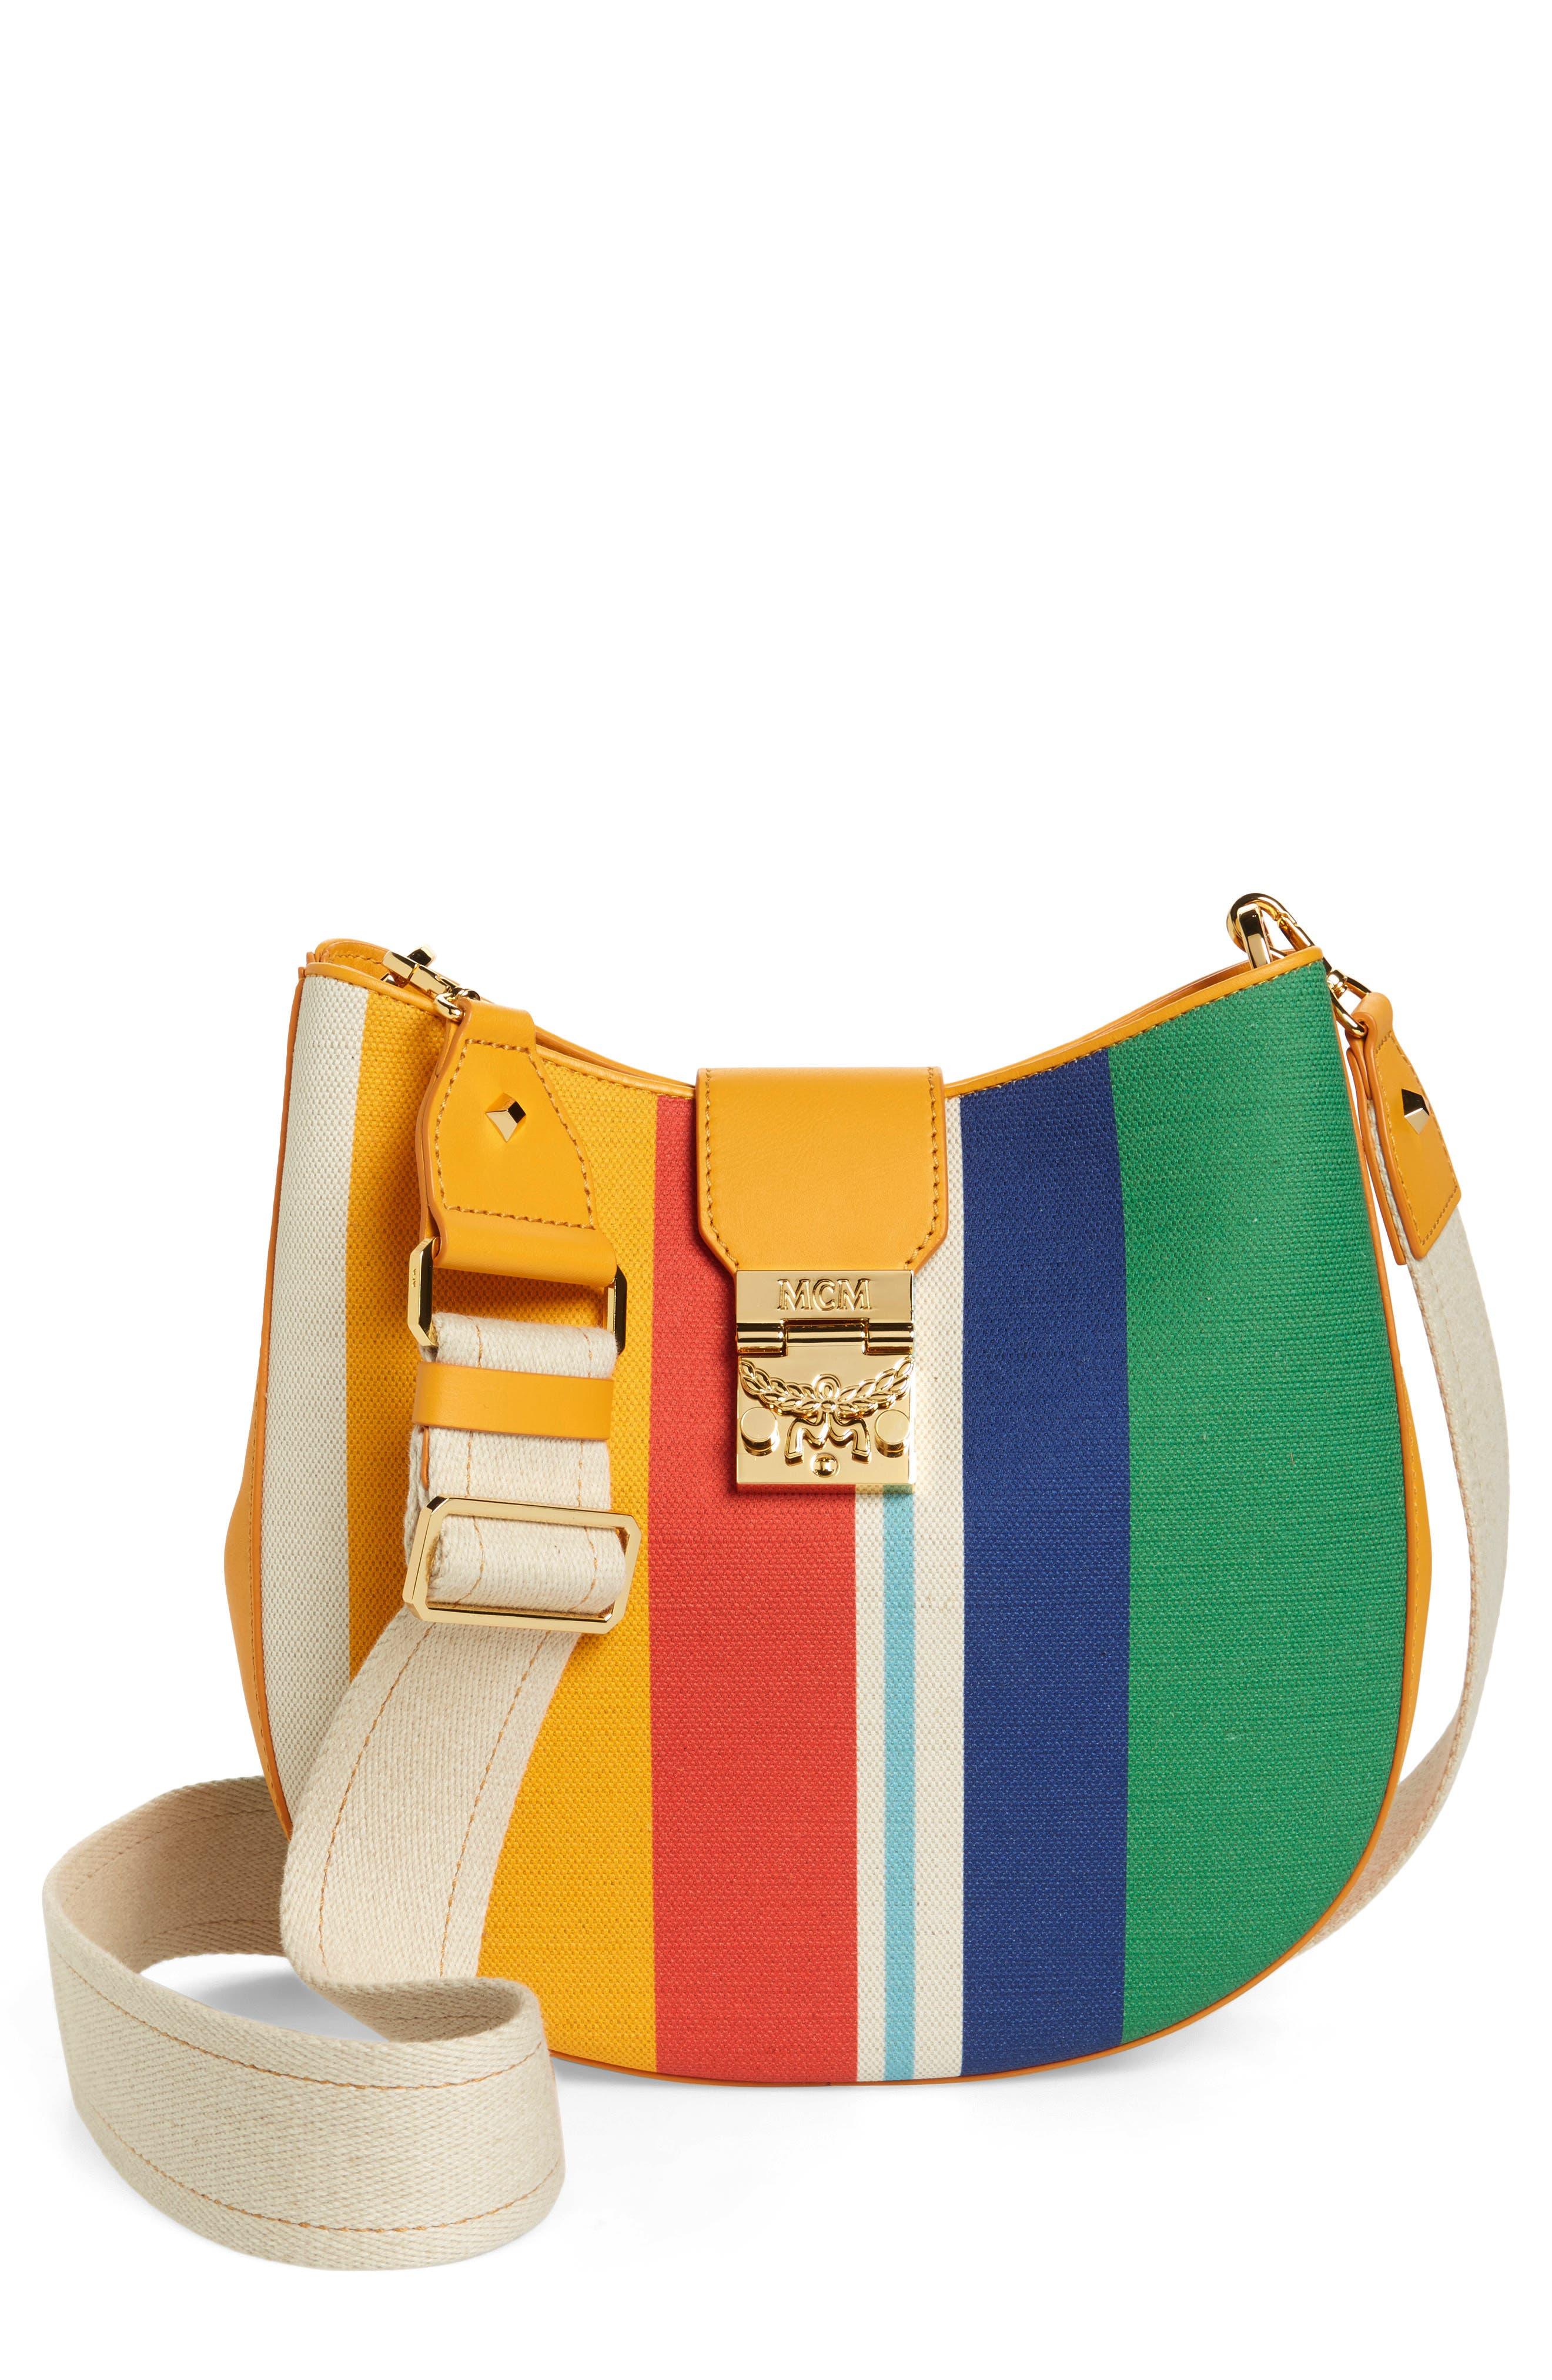 Medium Patricia Canvas Hobo Bag,                         Main,                         color, Rainbow Yellow